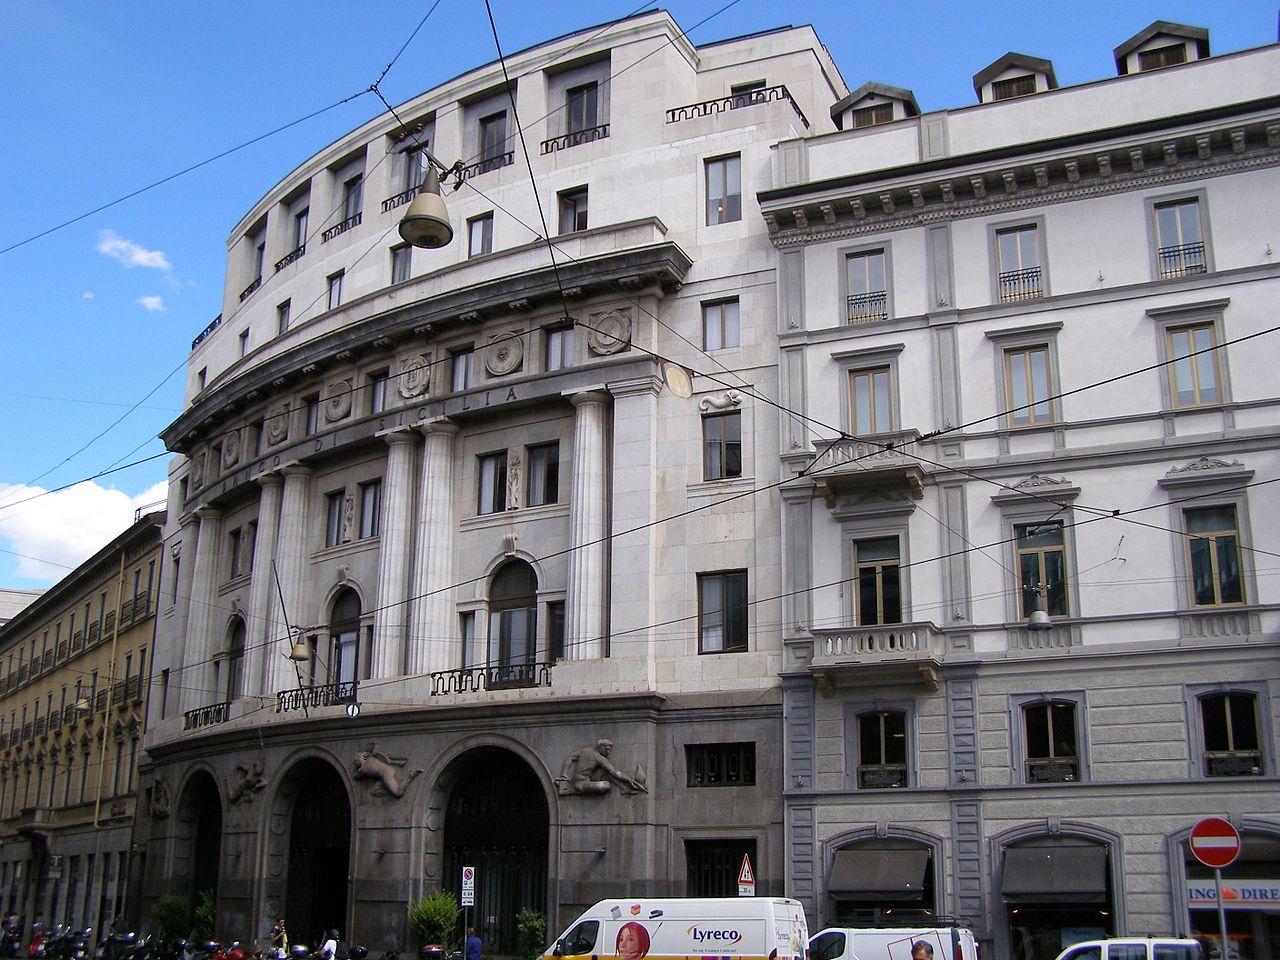 30-Milano_Via_Santa_Margherita_kamienica.jpg